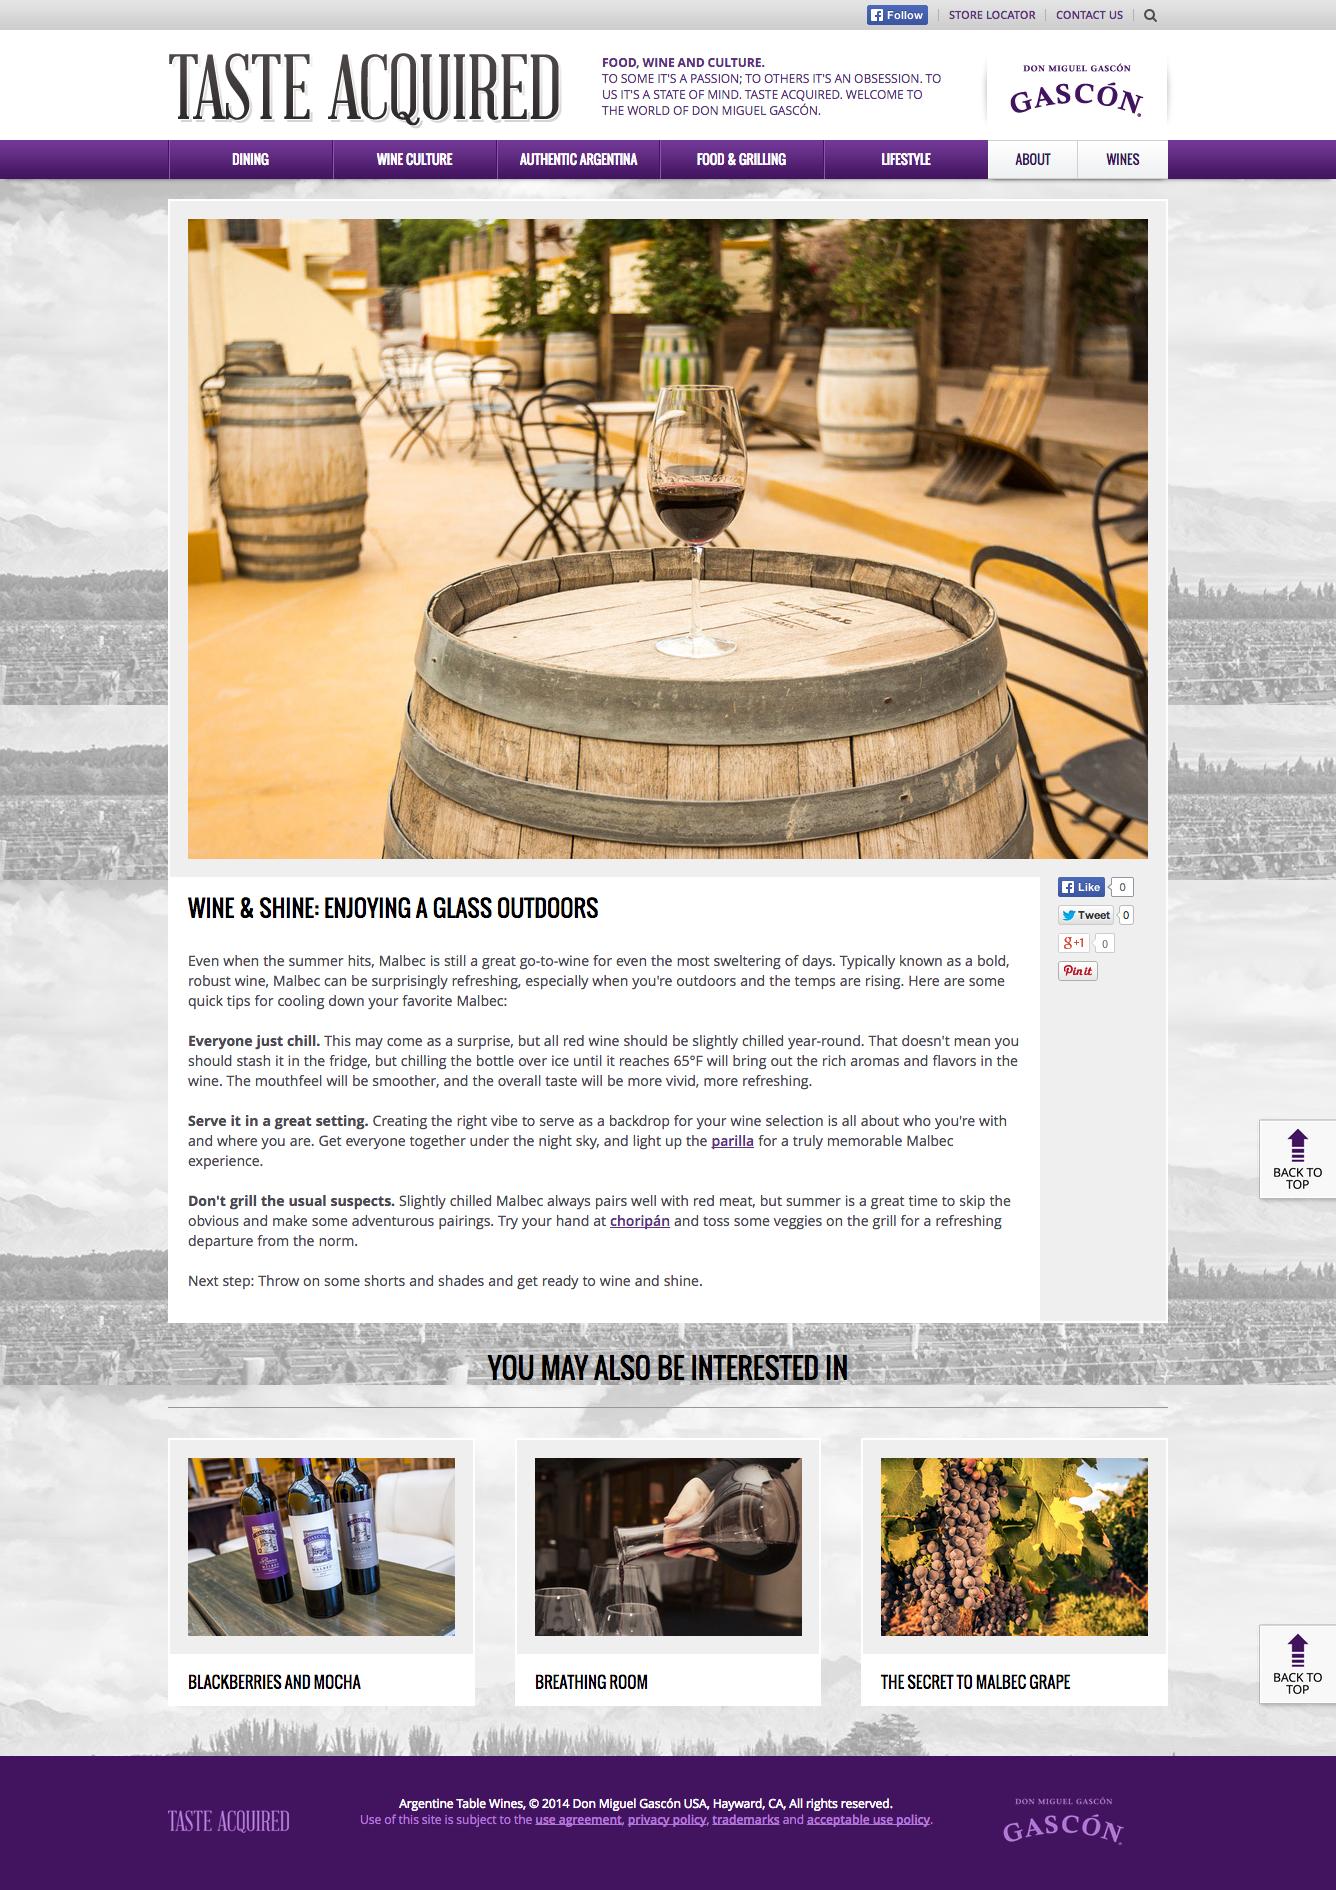 screencapture-www-gasconwine-com-Wine-Culture-enjoying-wine-outdoors-php.png